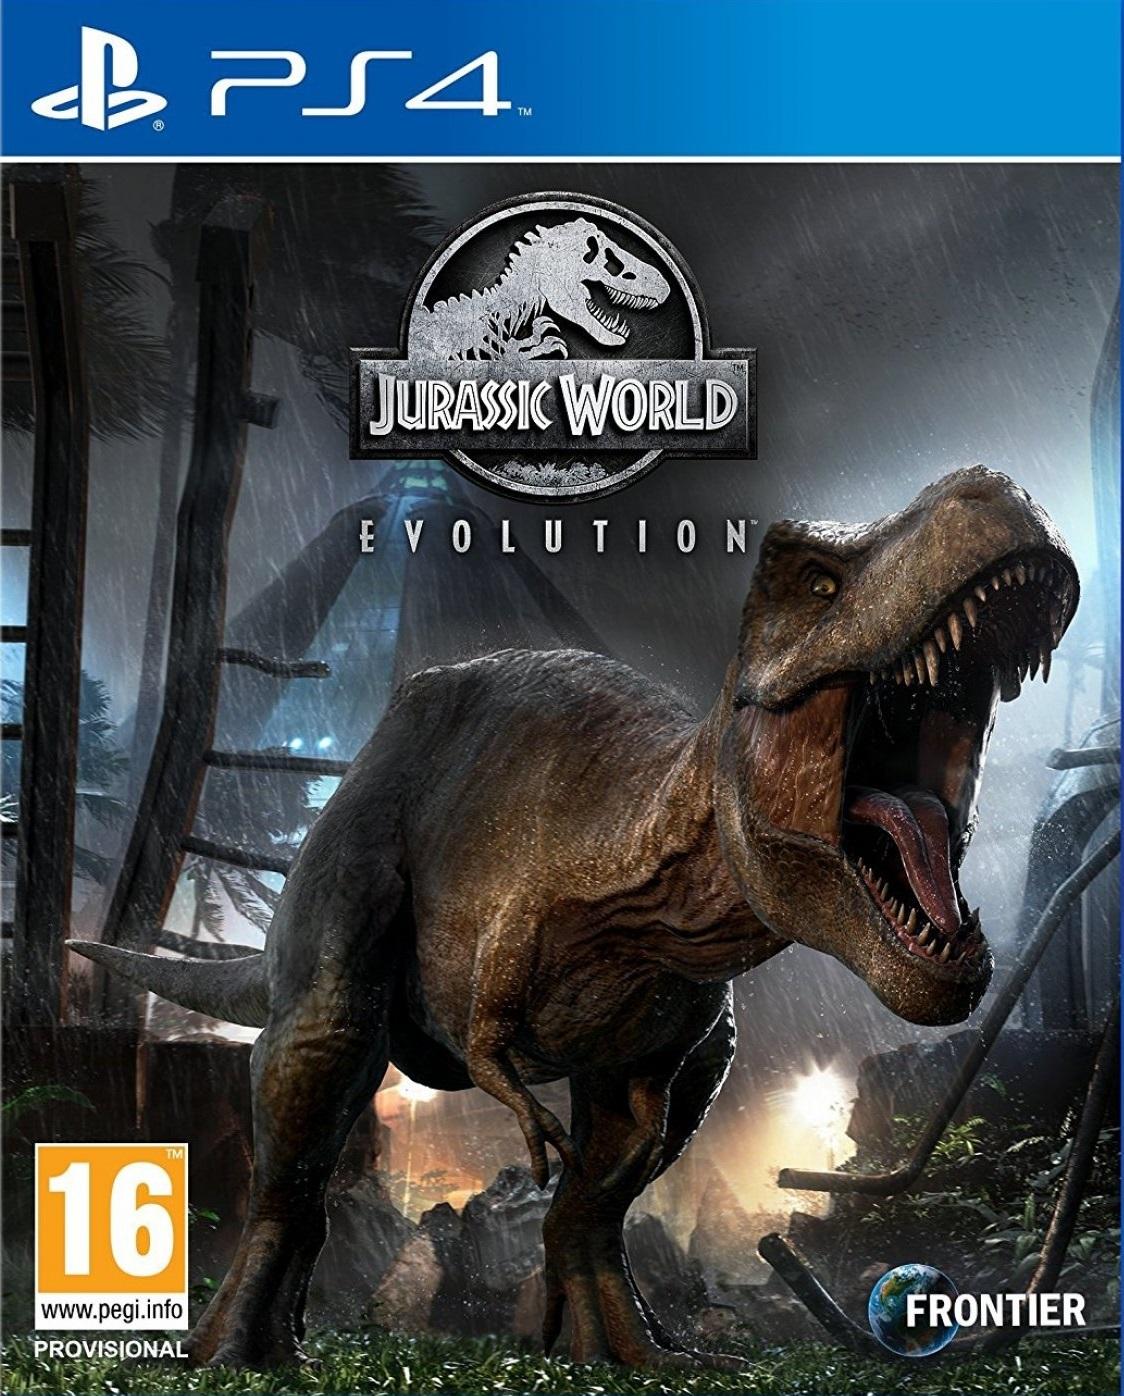 jurassic-world-evolution-559493.11.jpg